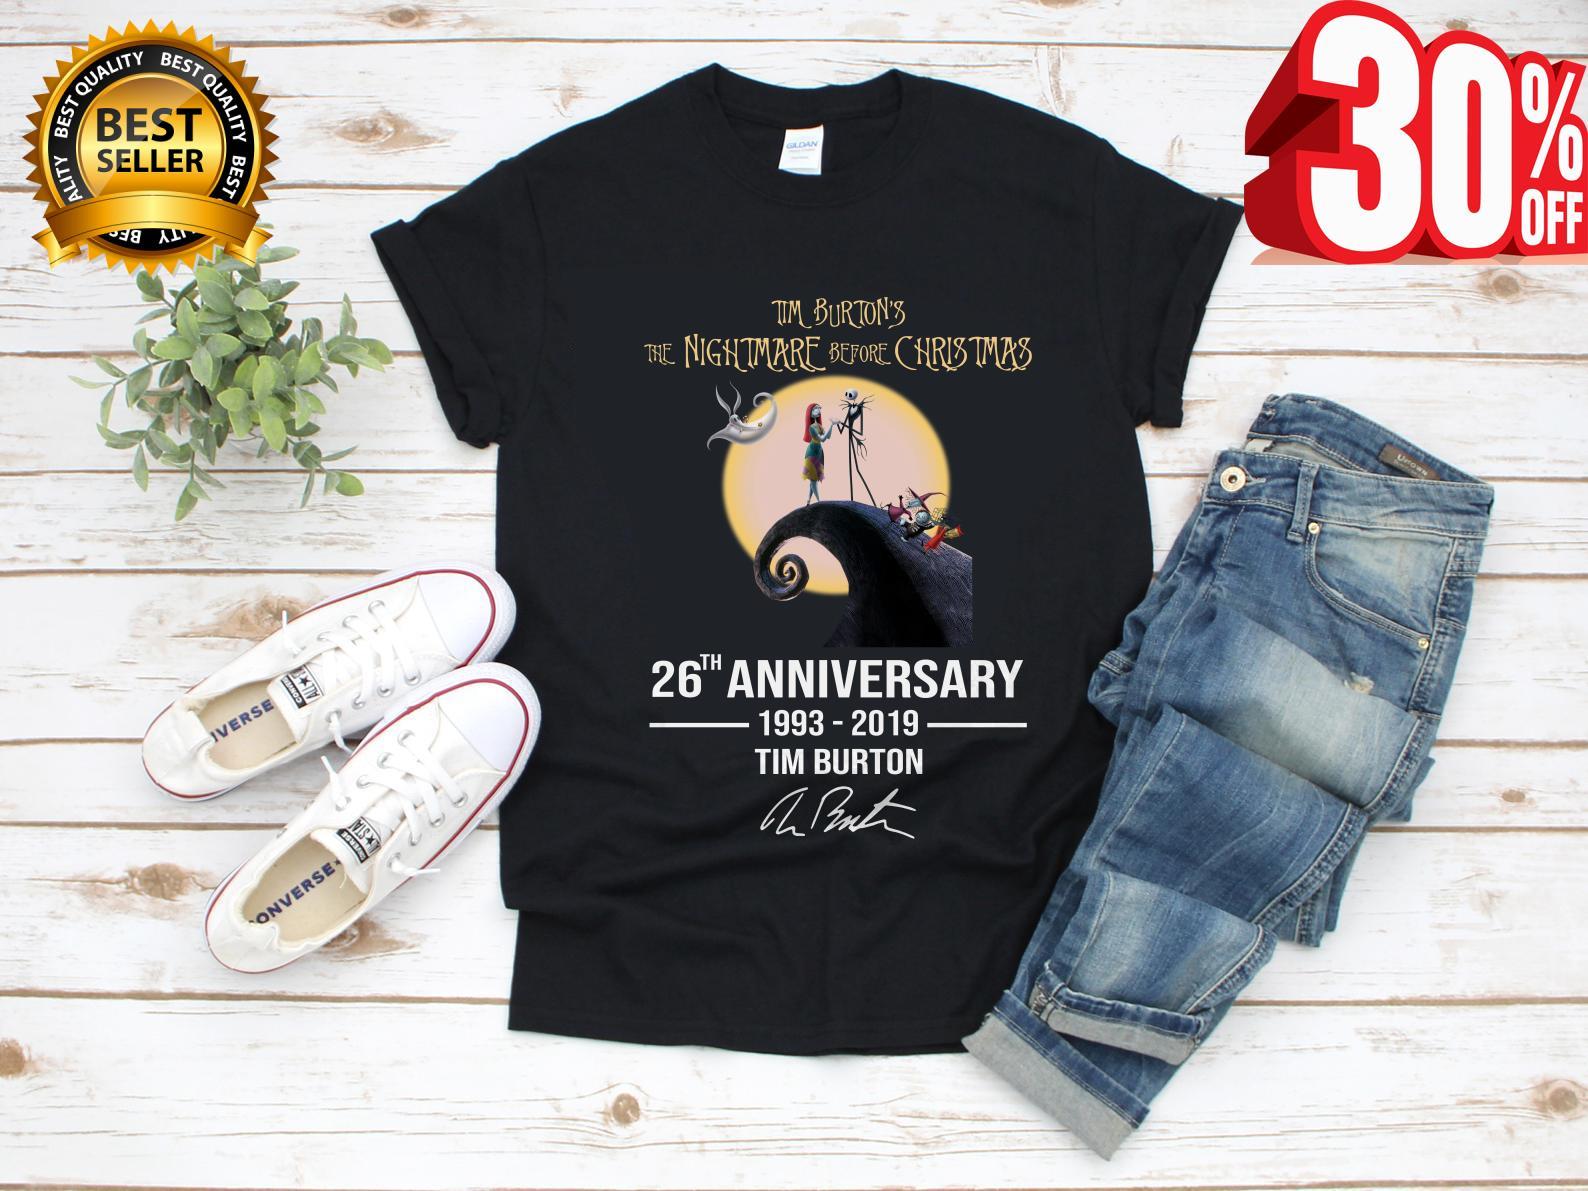 6a94a1d5 Tim Burton's the nightmare before christmas 26th anniversary 1993 2019  signature shirt